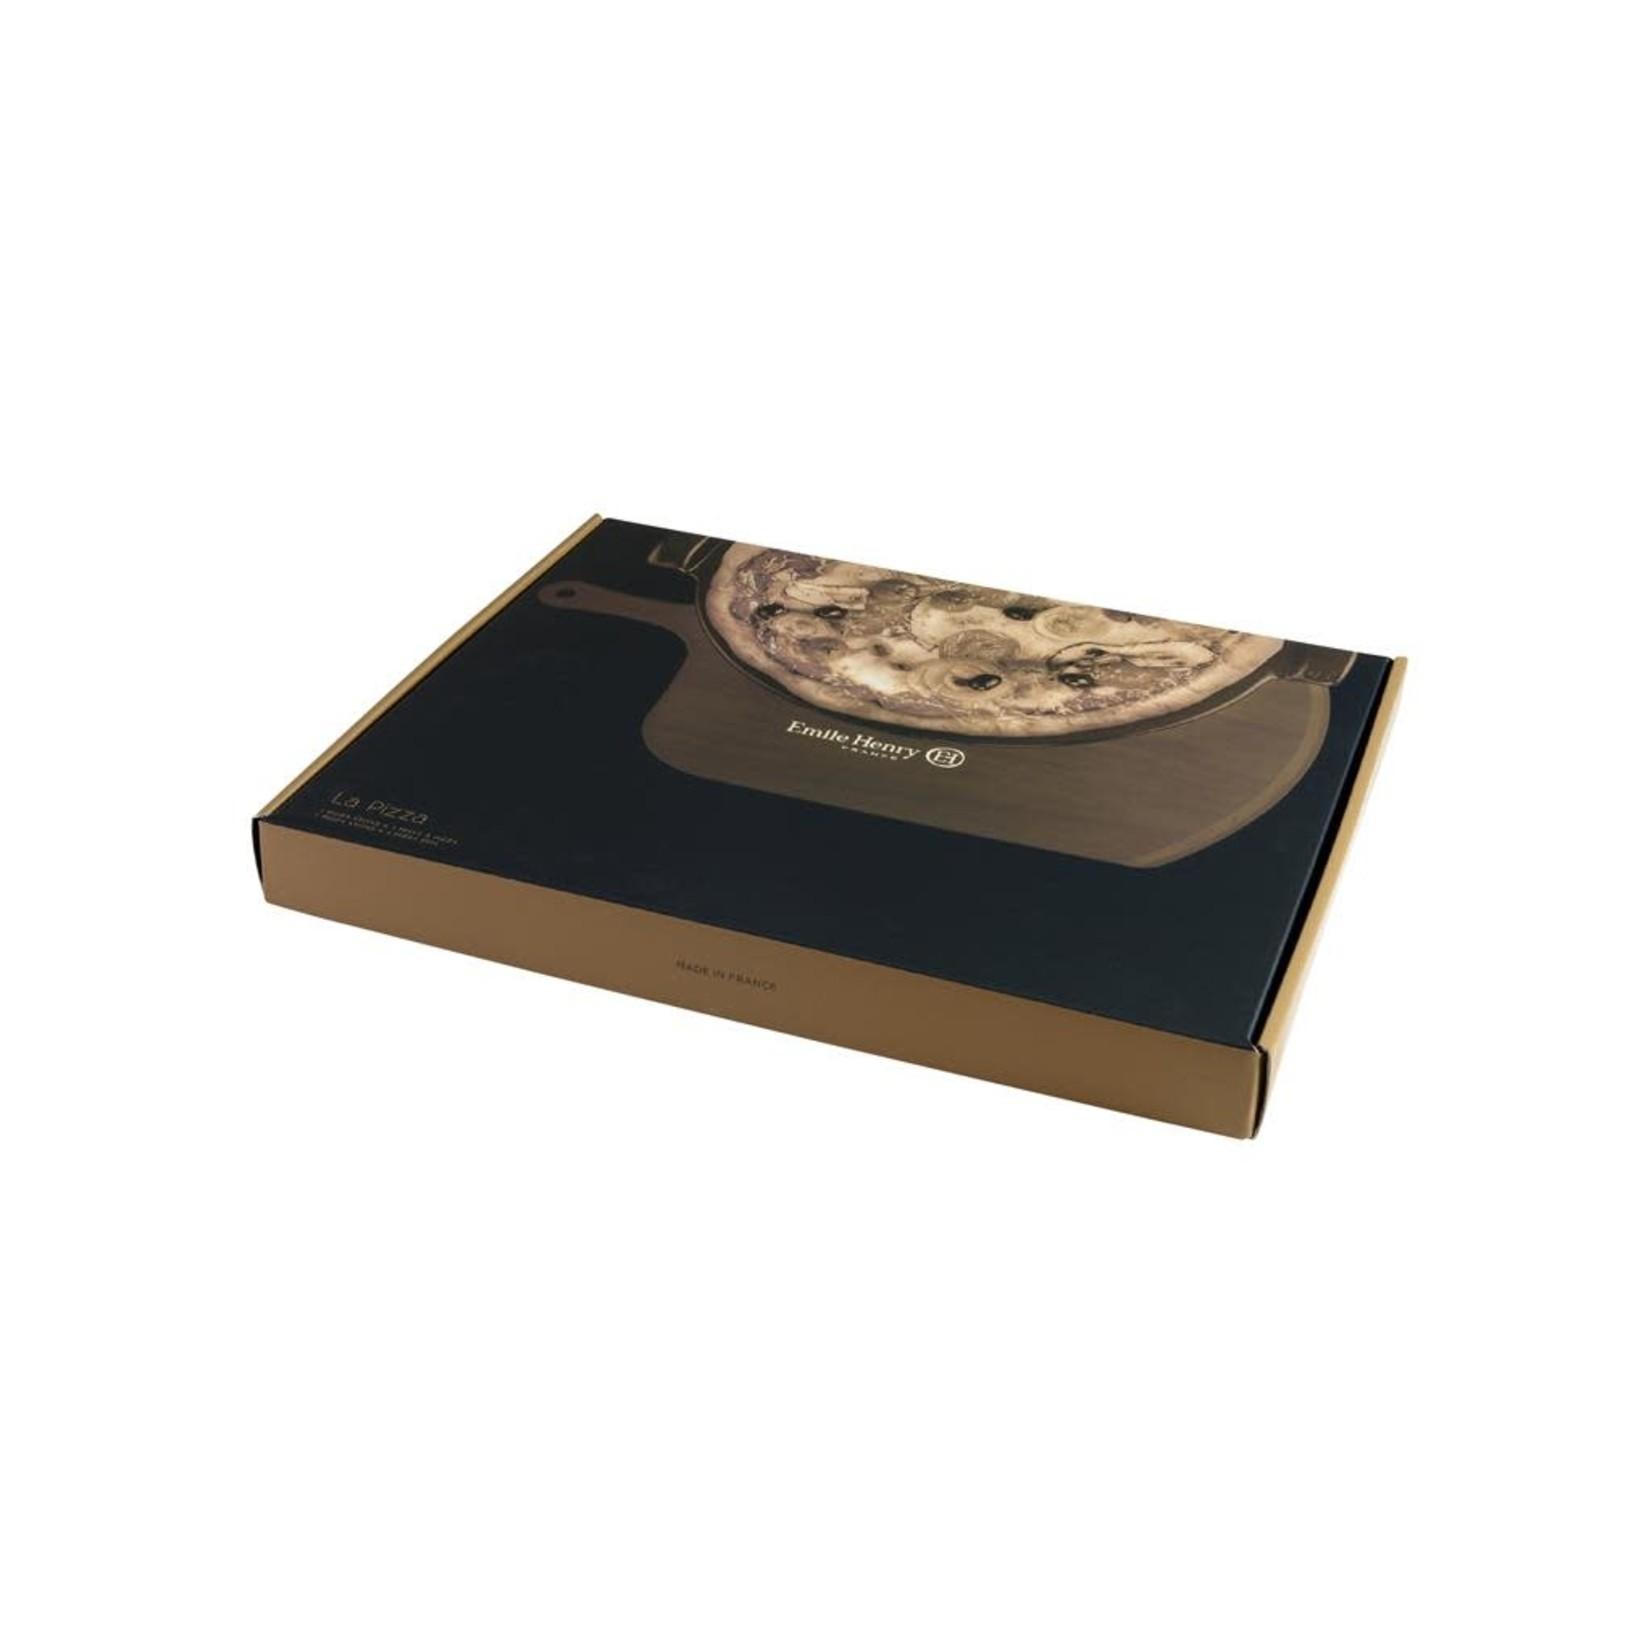 Pizza Stone Set, Fusain